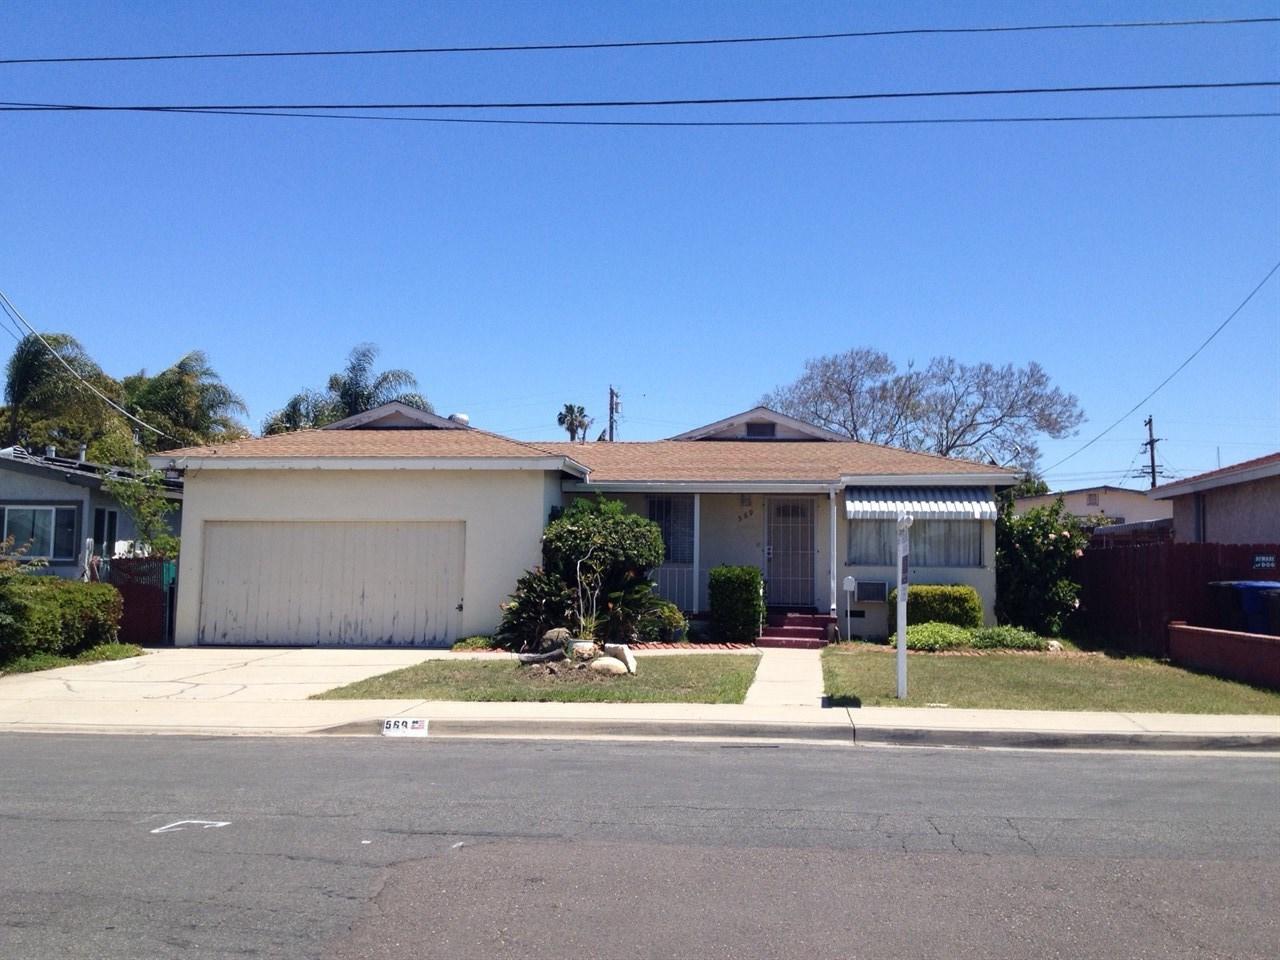 569 Fig Ave, Chula Vista, CA